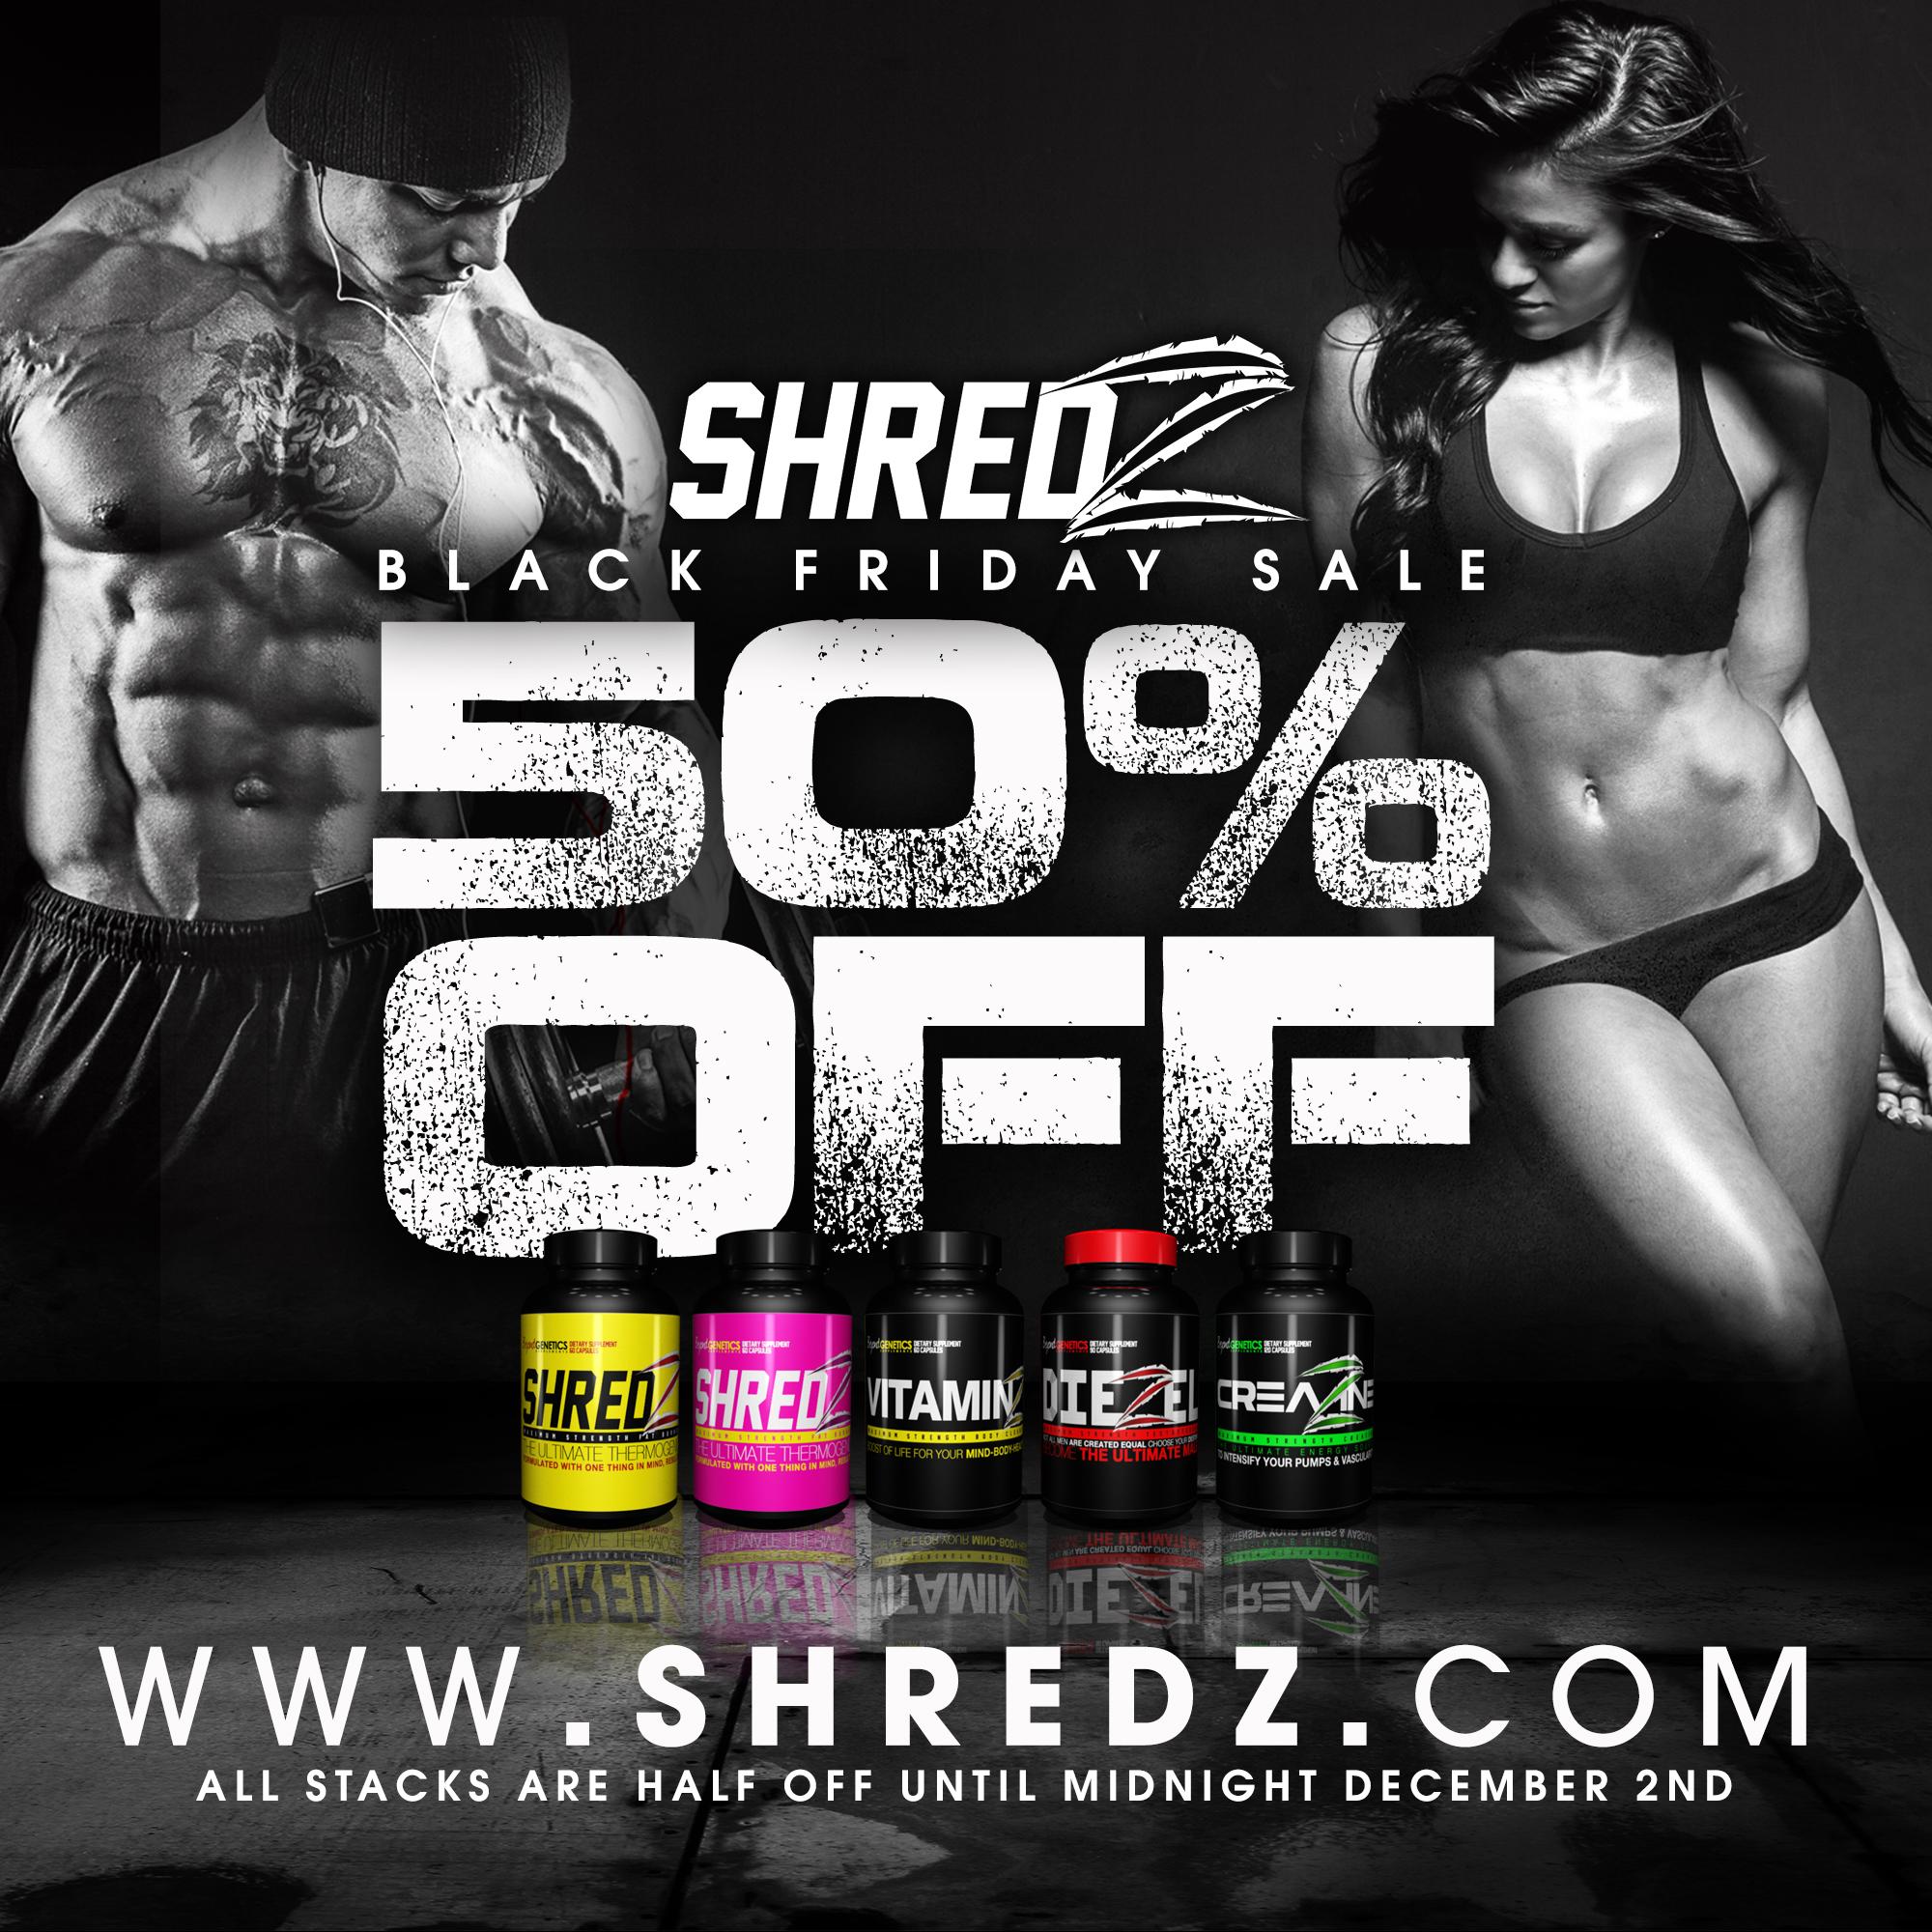 Black friday supplement sales